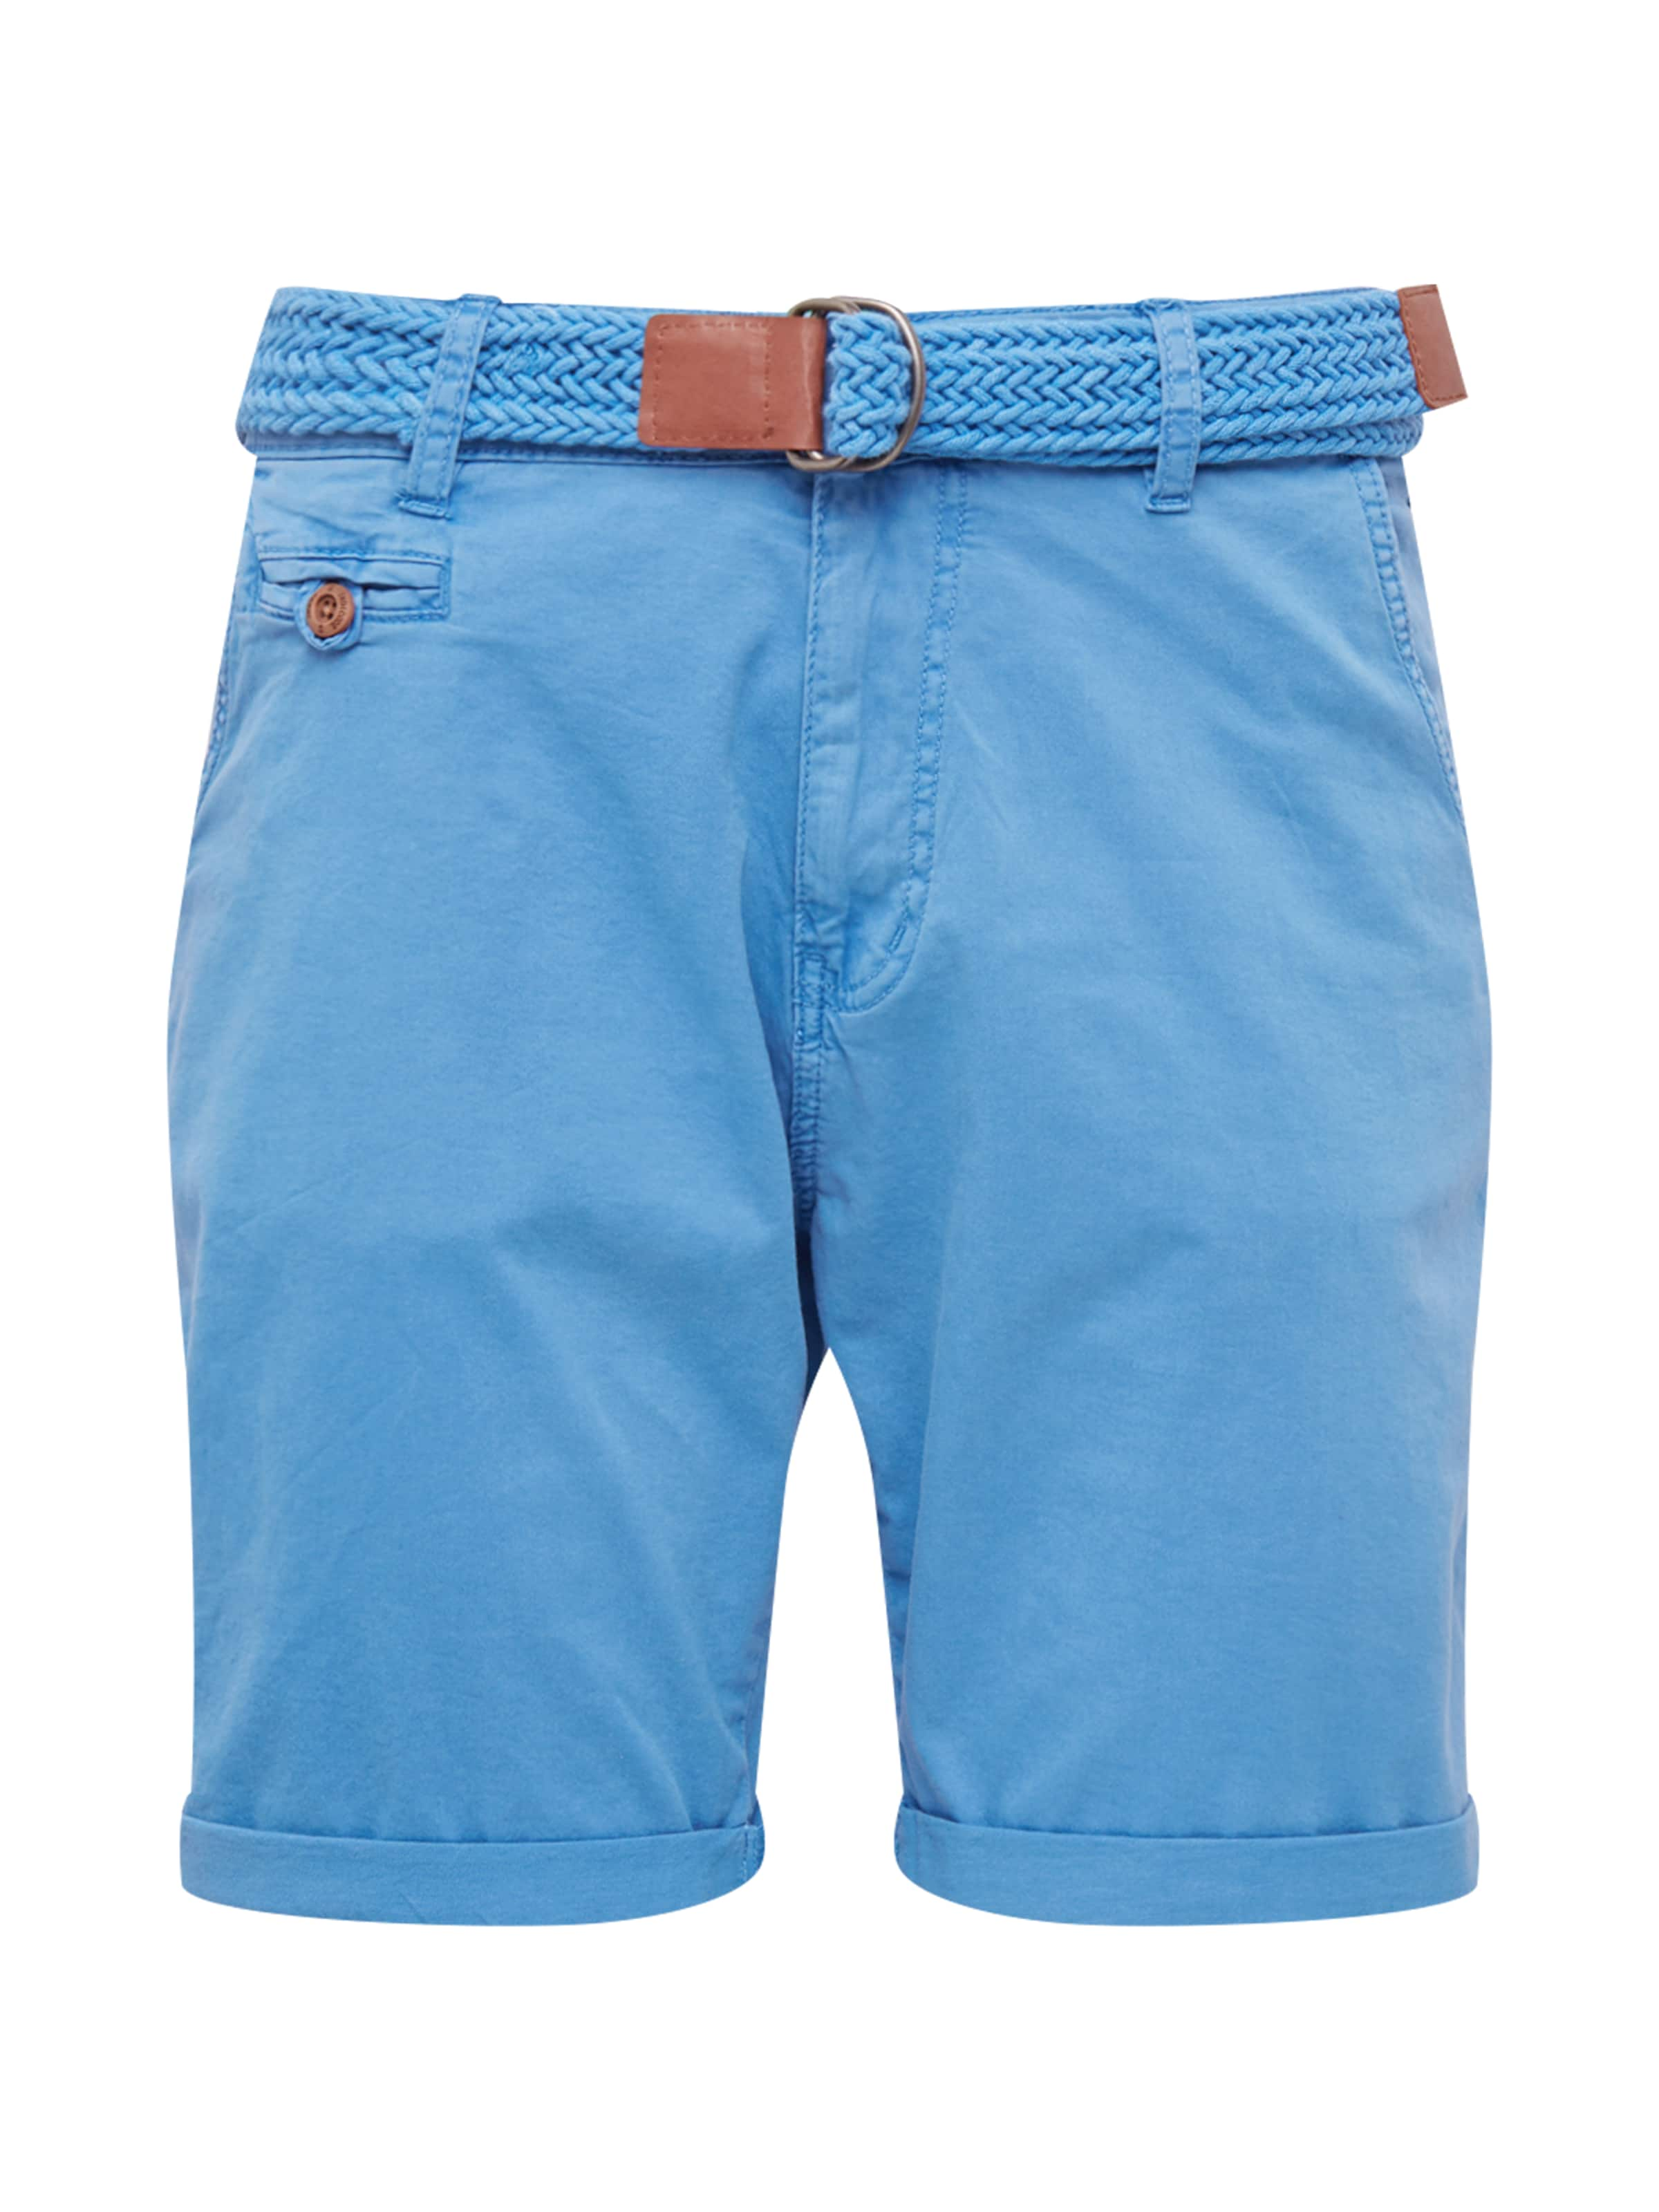 Chino 'conor' Gris Indicode In JeansPantalon XiTwkZOPu